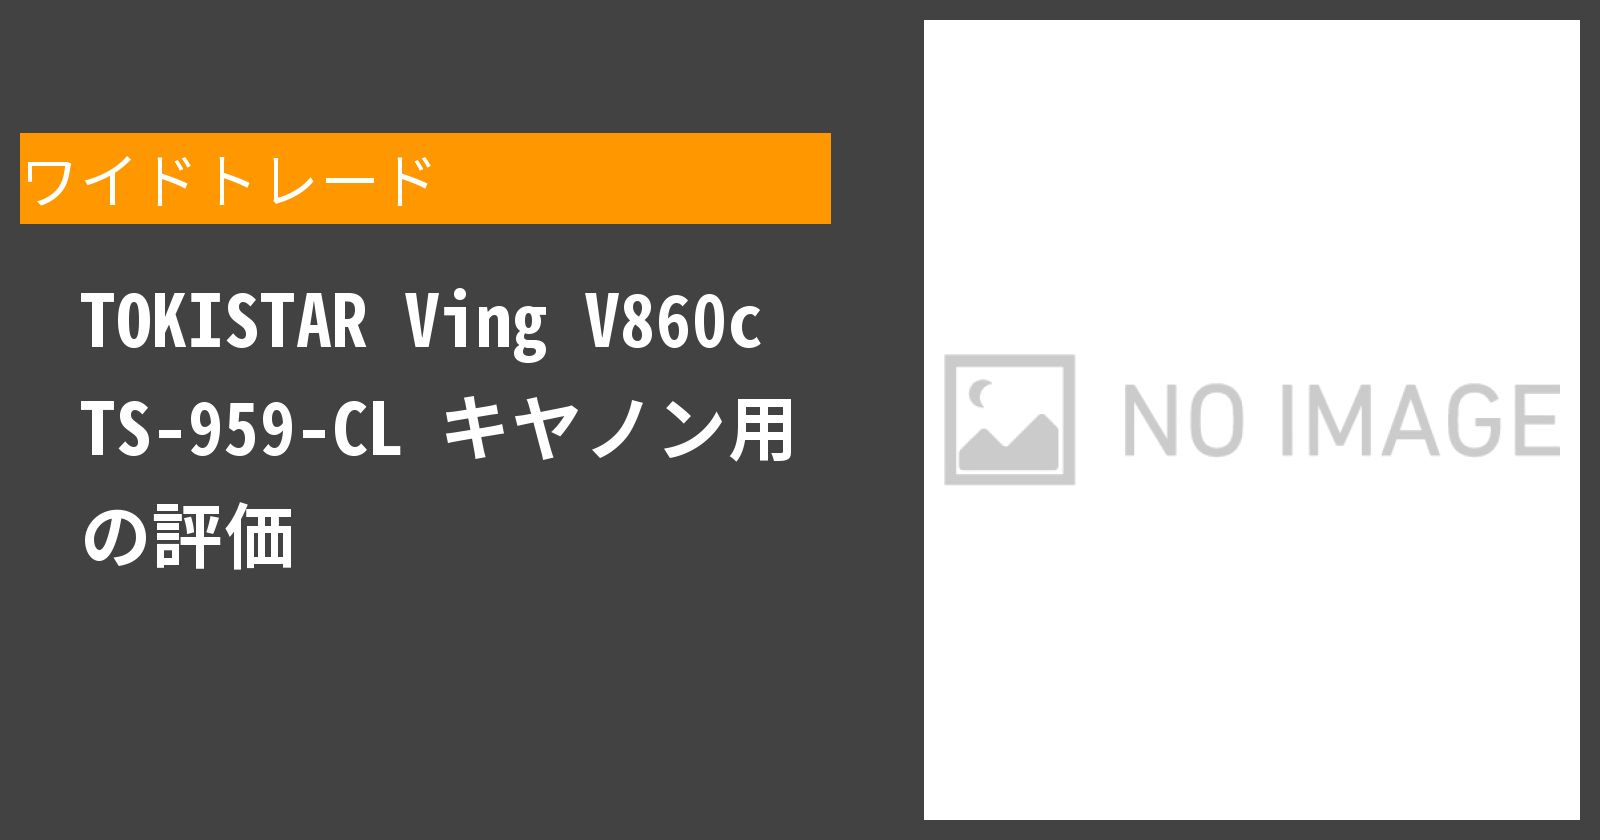 TOKISTAR Ving V860c TS-959-CL キヤノン用を徹底評価